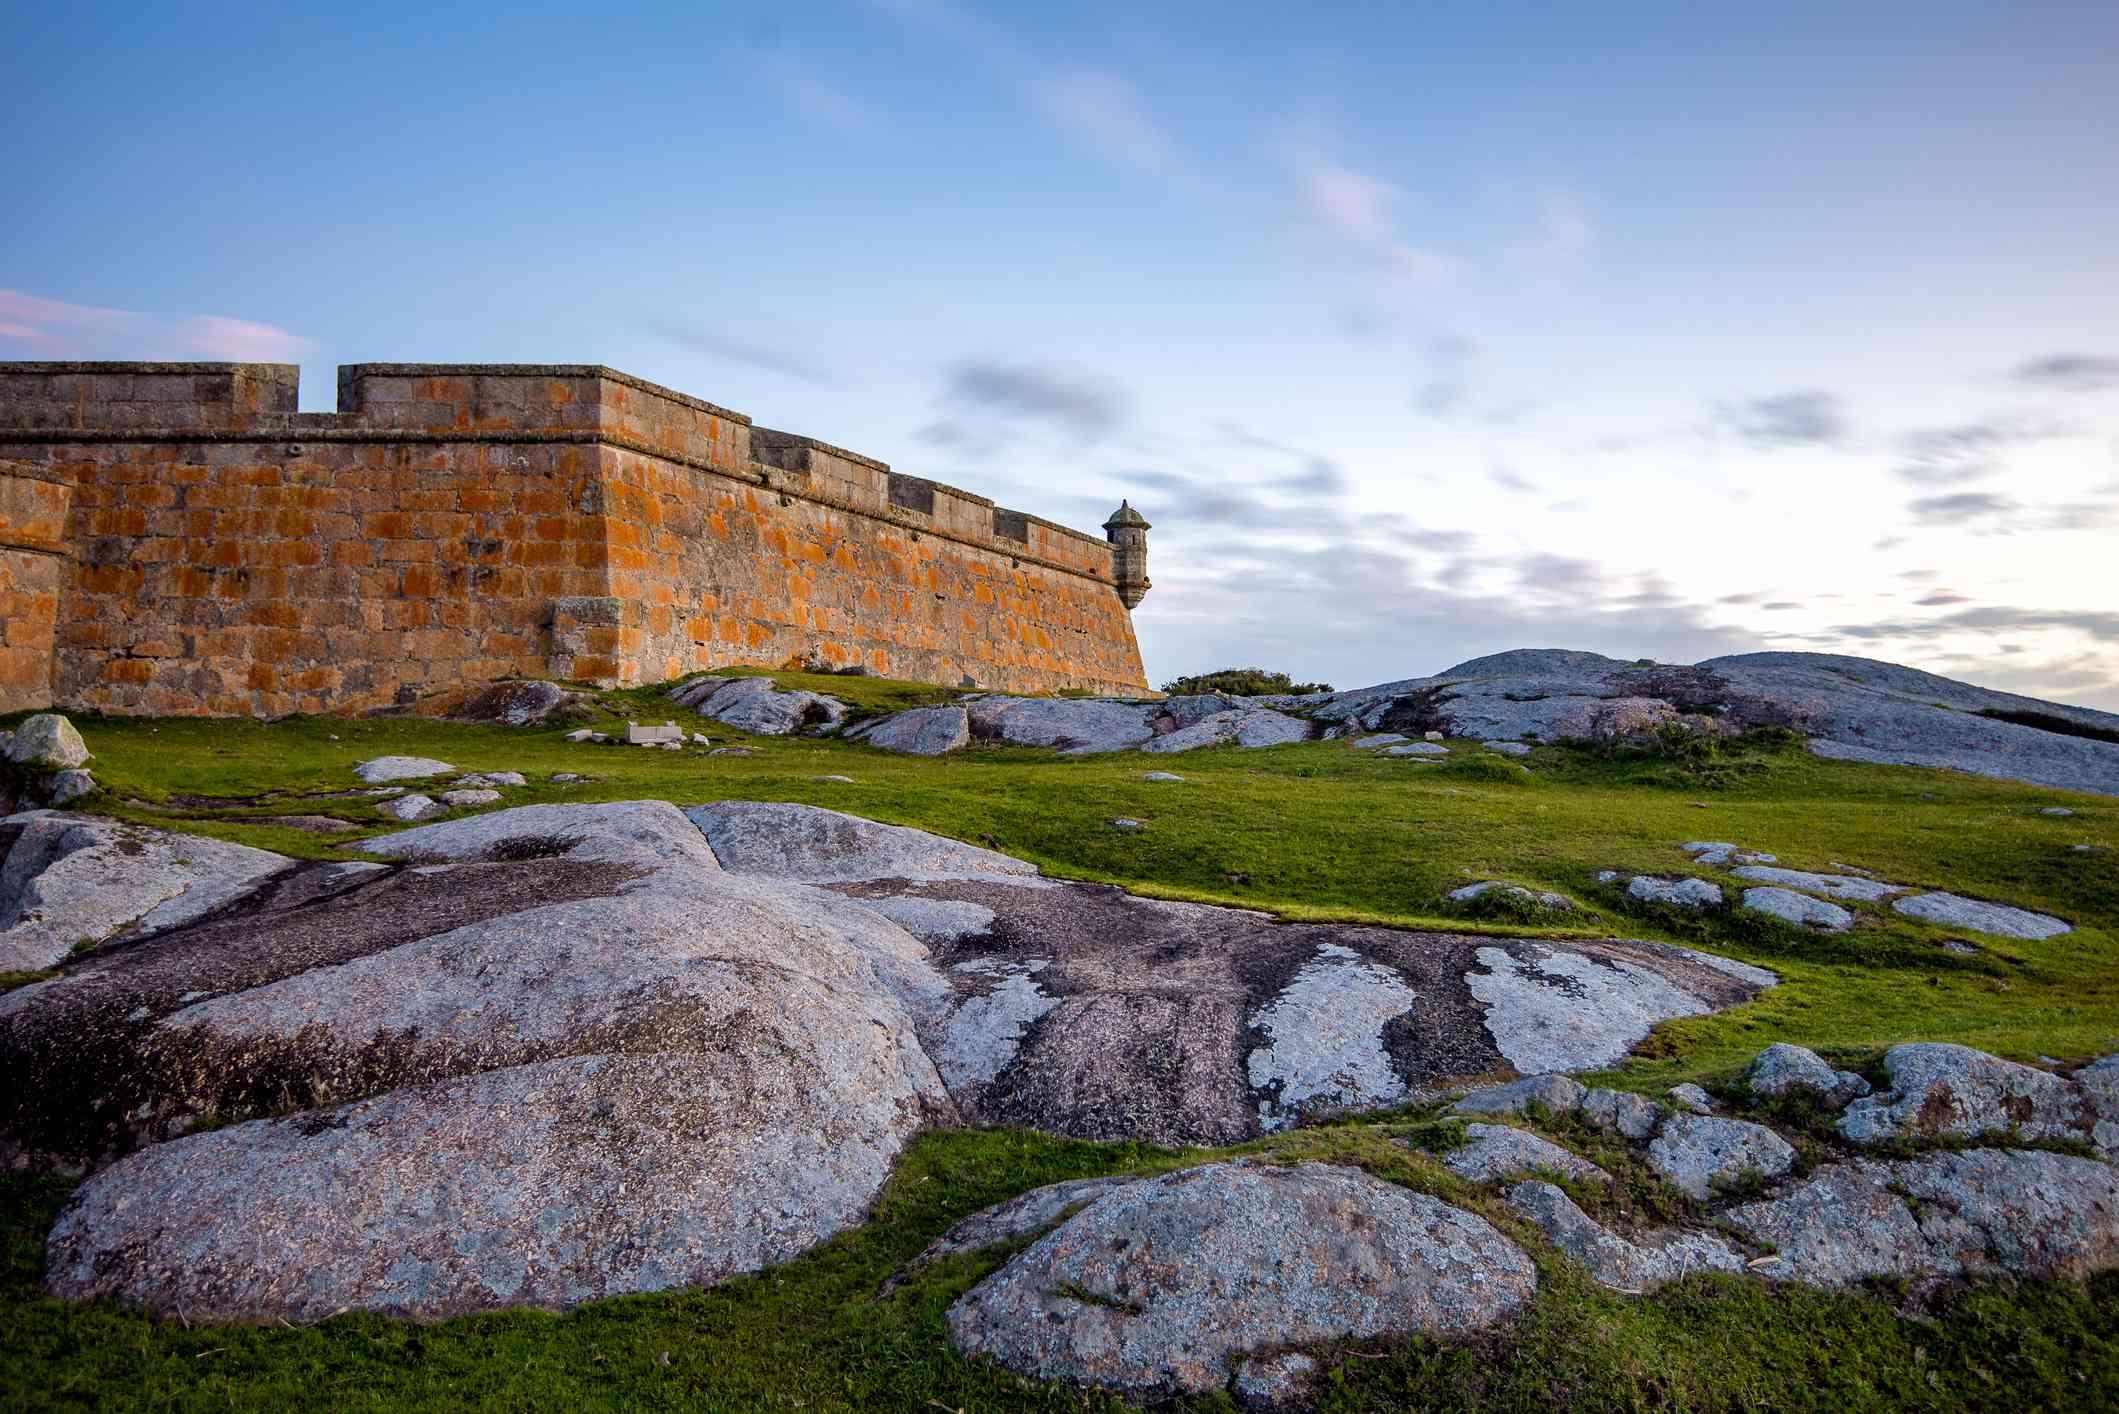 Santa Teresa Fort in Uruguay